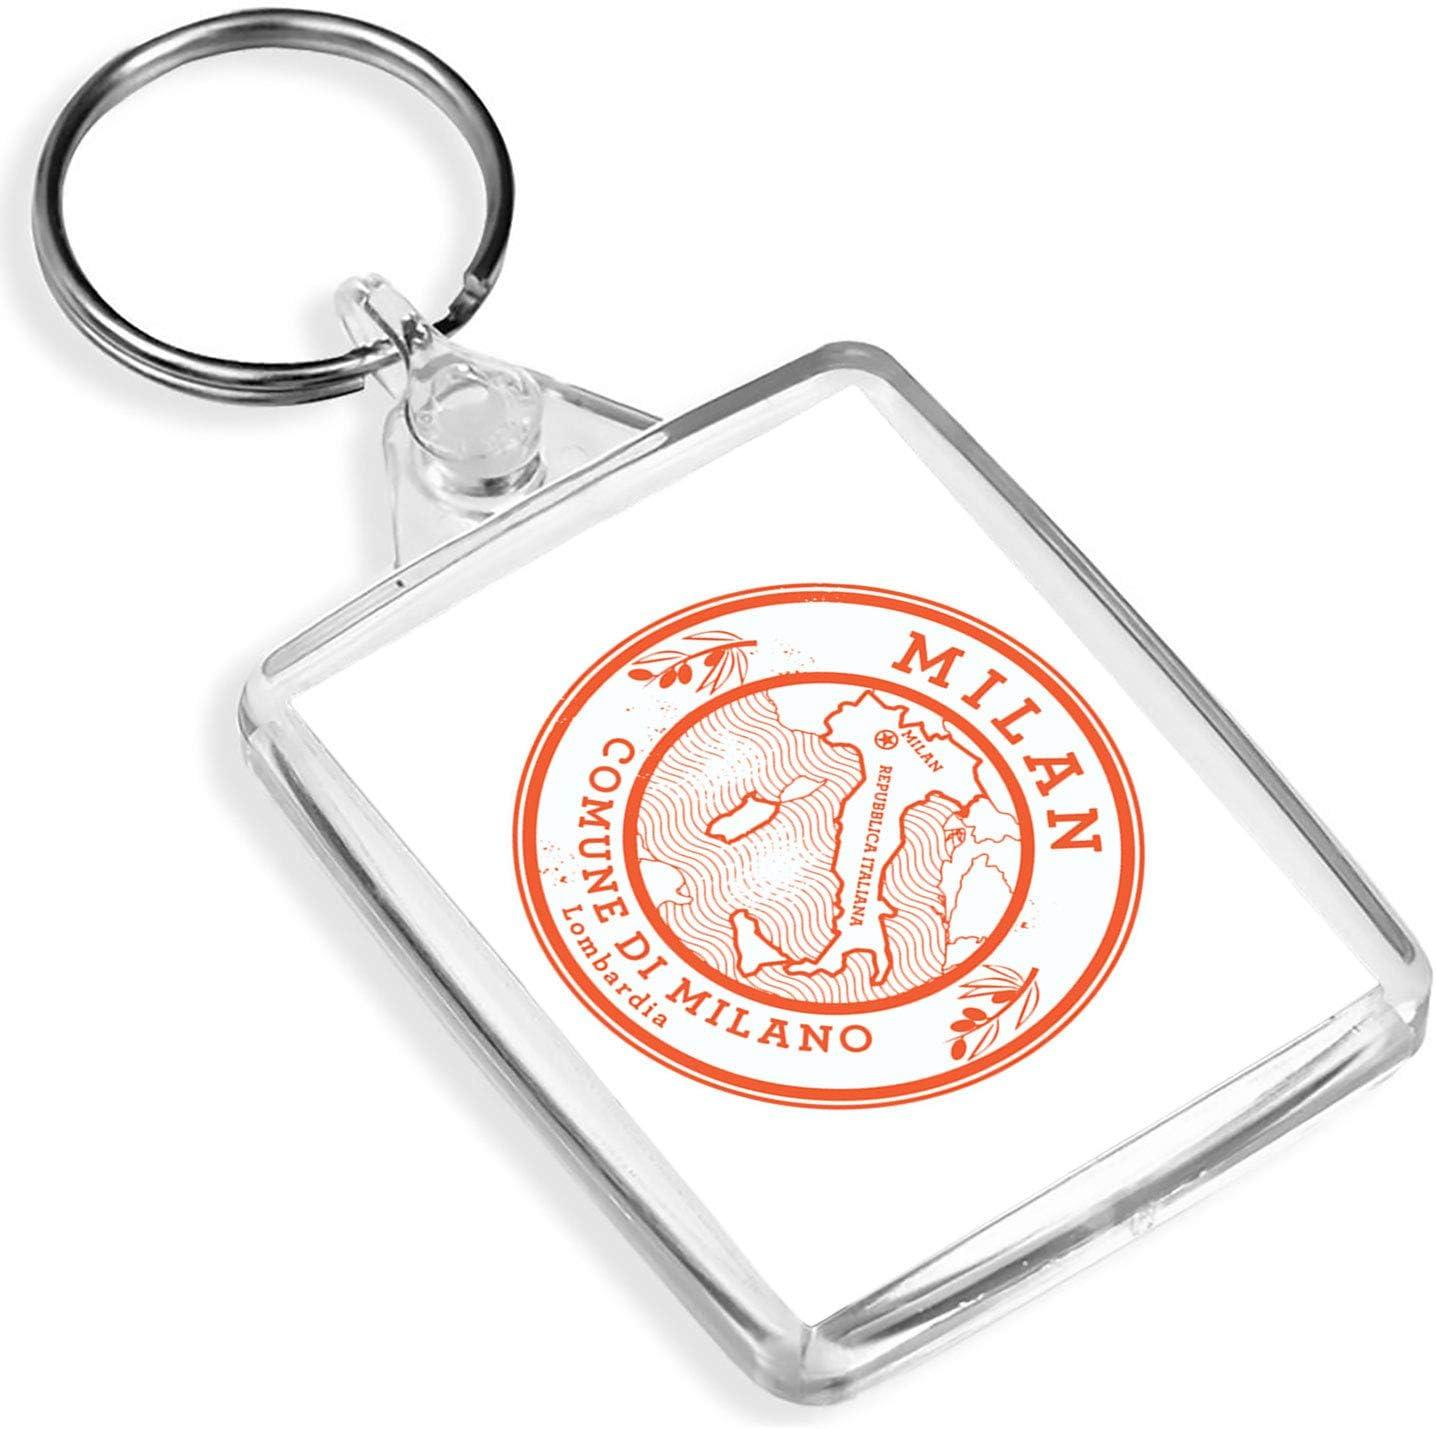 Milano Italy Keyring Travel Souvenir Keychain